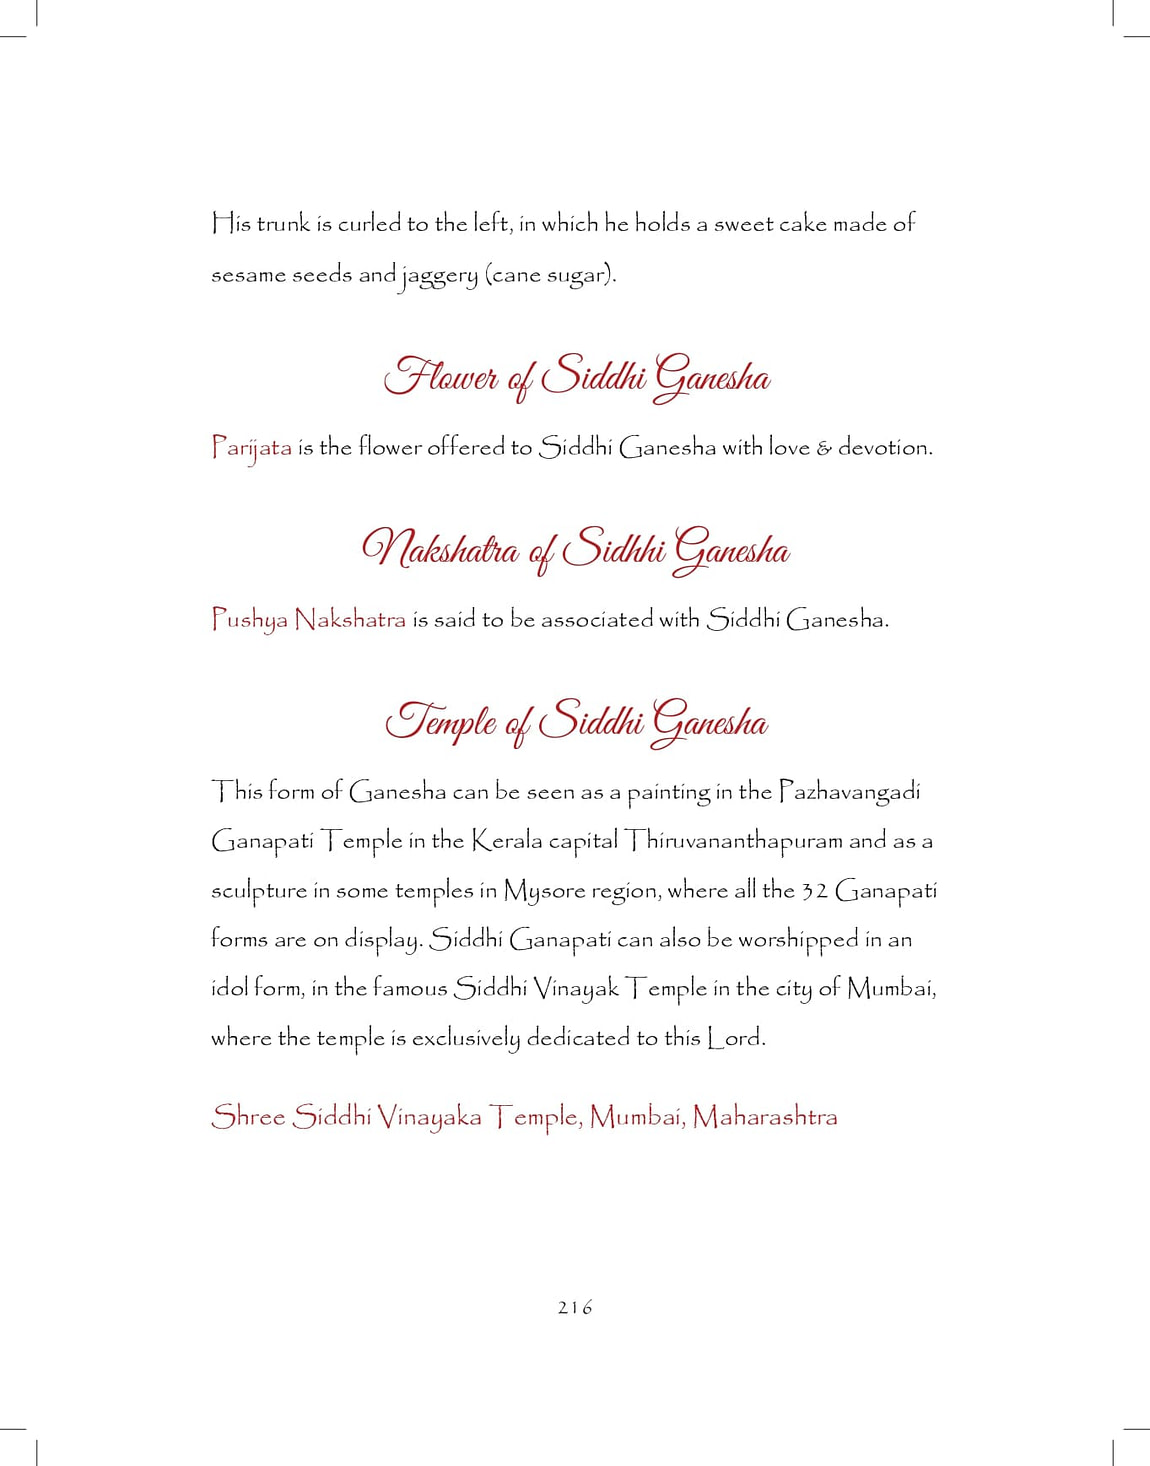 Ganesh-print_pages-to-jpg-0216.jpg